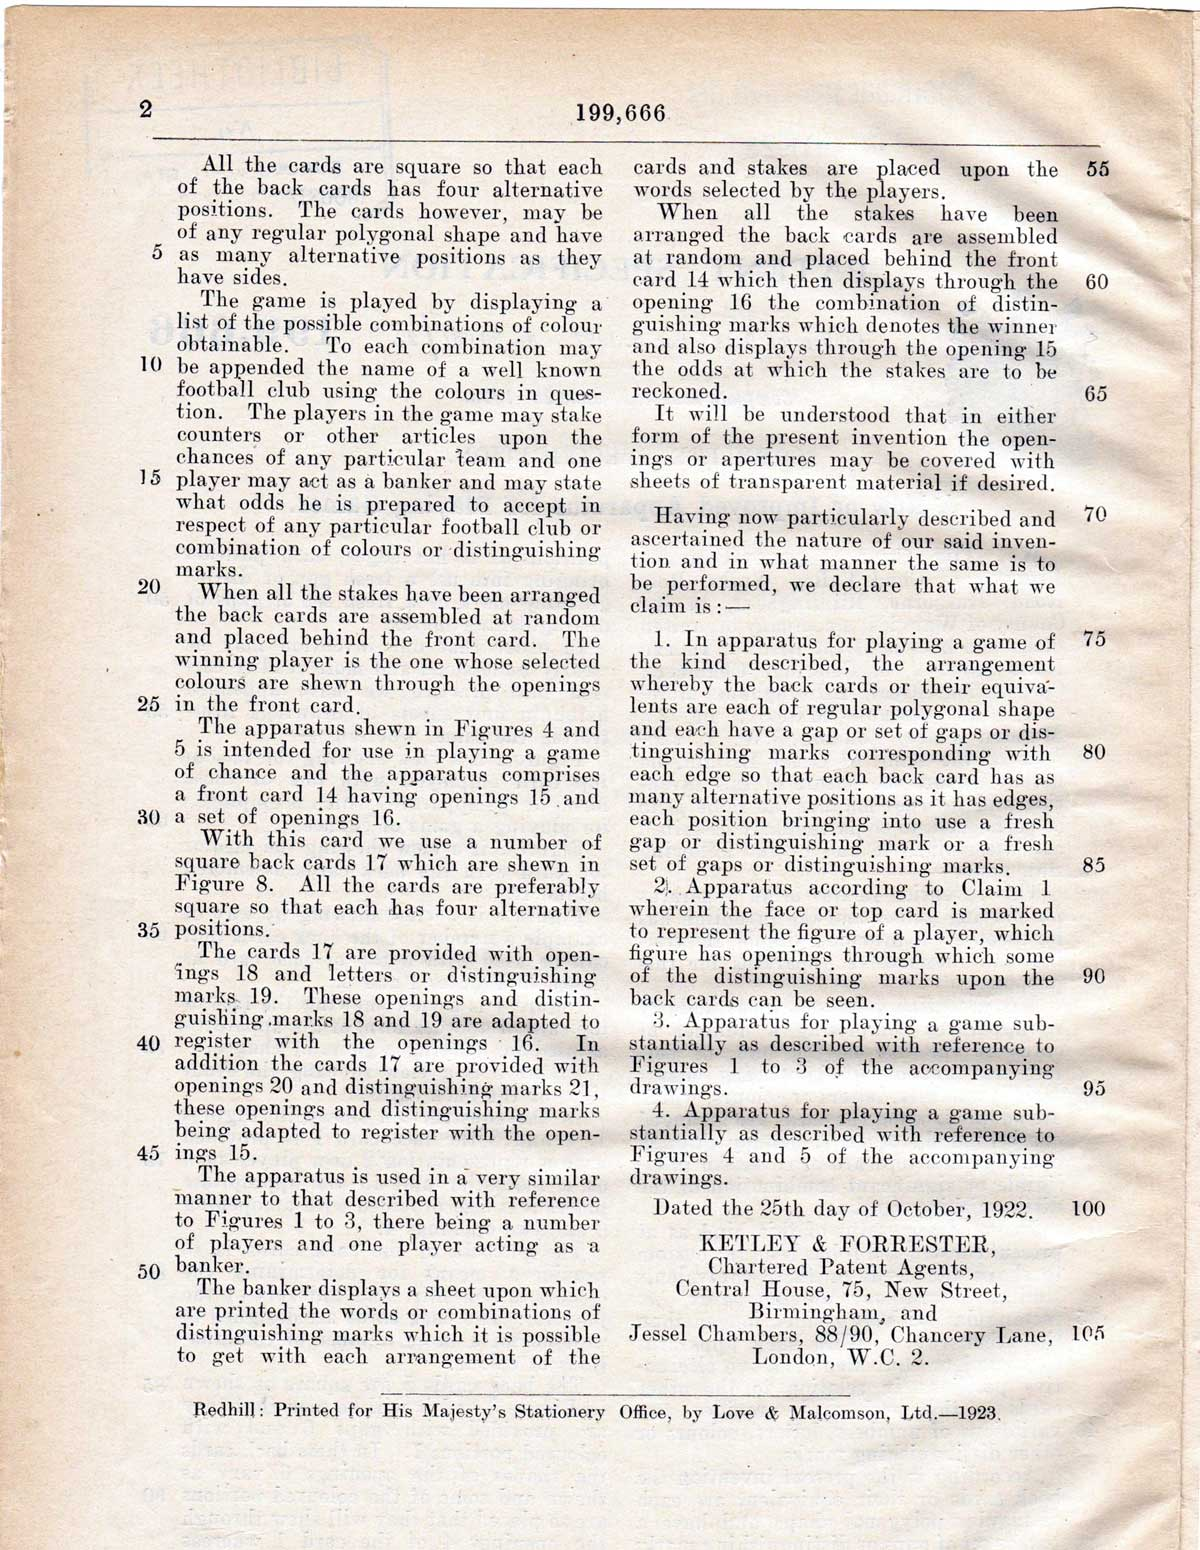 Uback patent, 1922